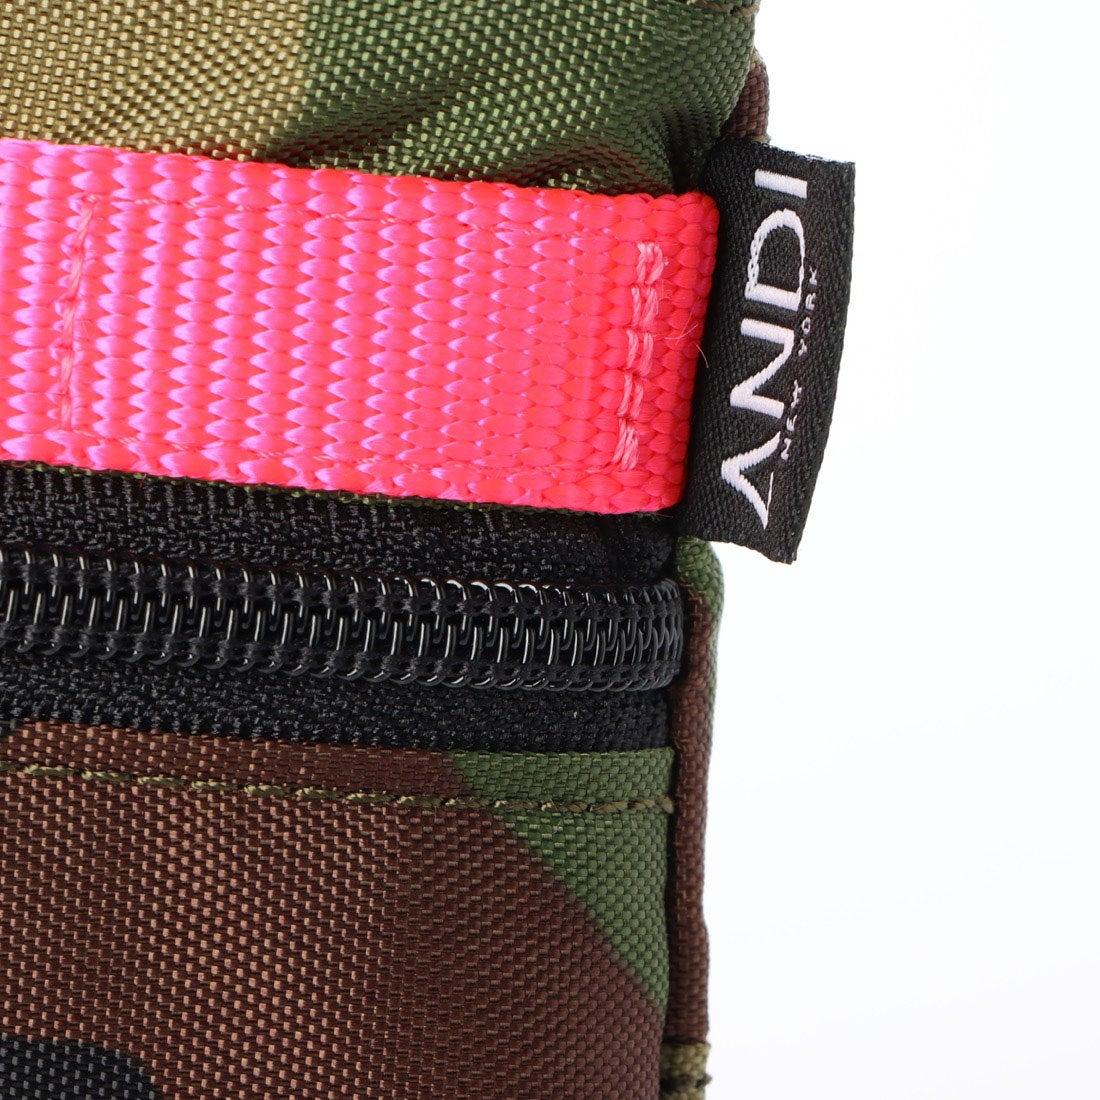 【ANDI】3WAYクラッチバッグ[Camo Pop Pink]